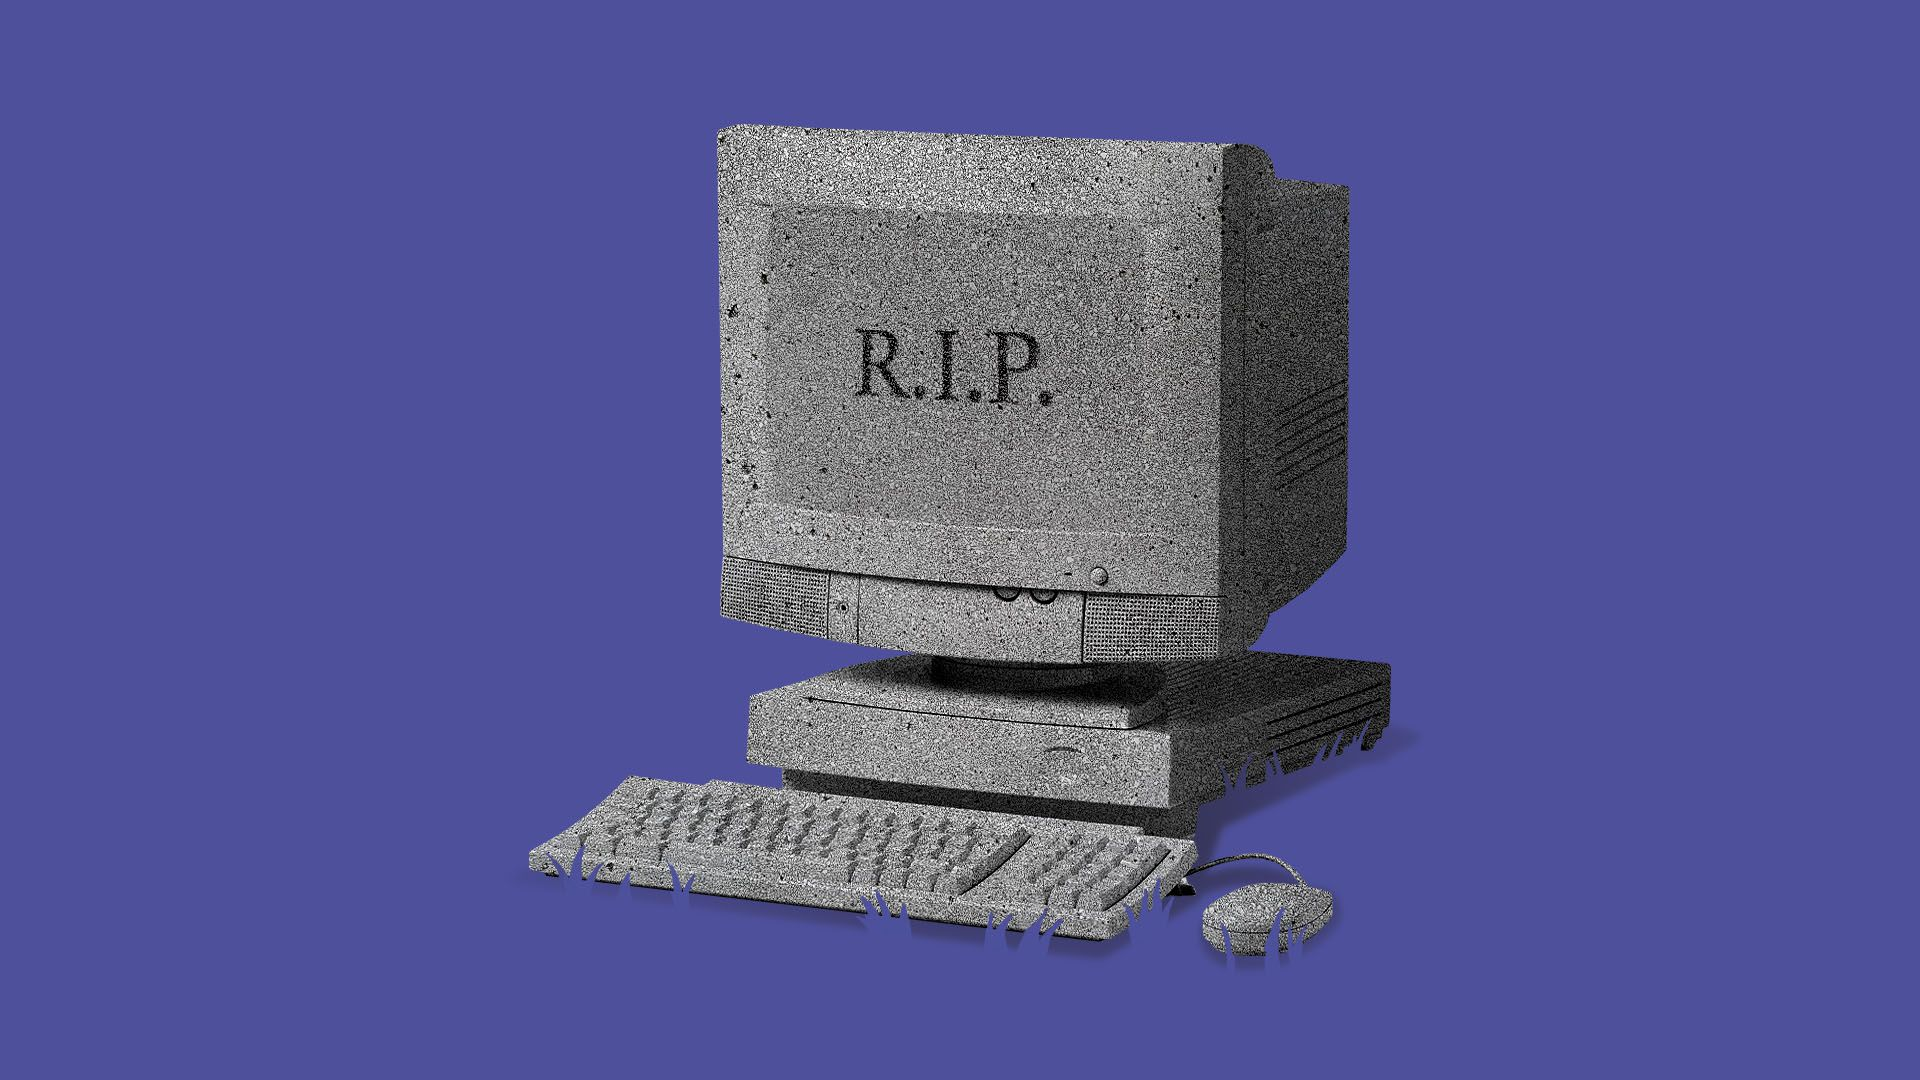 6. How tech platforms handle a user's death